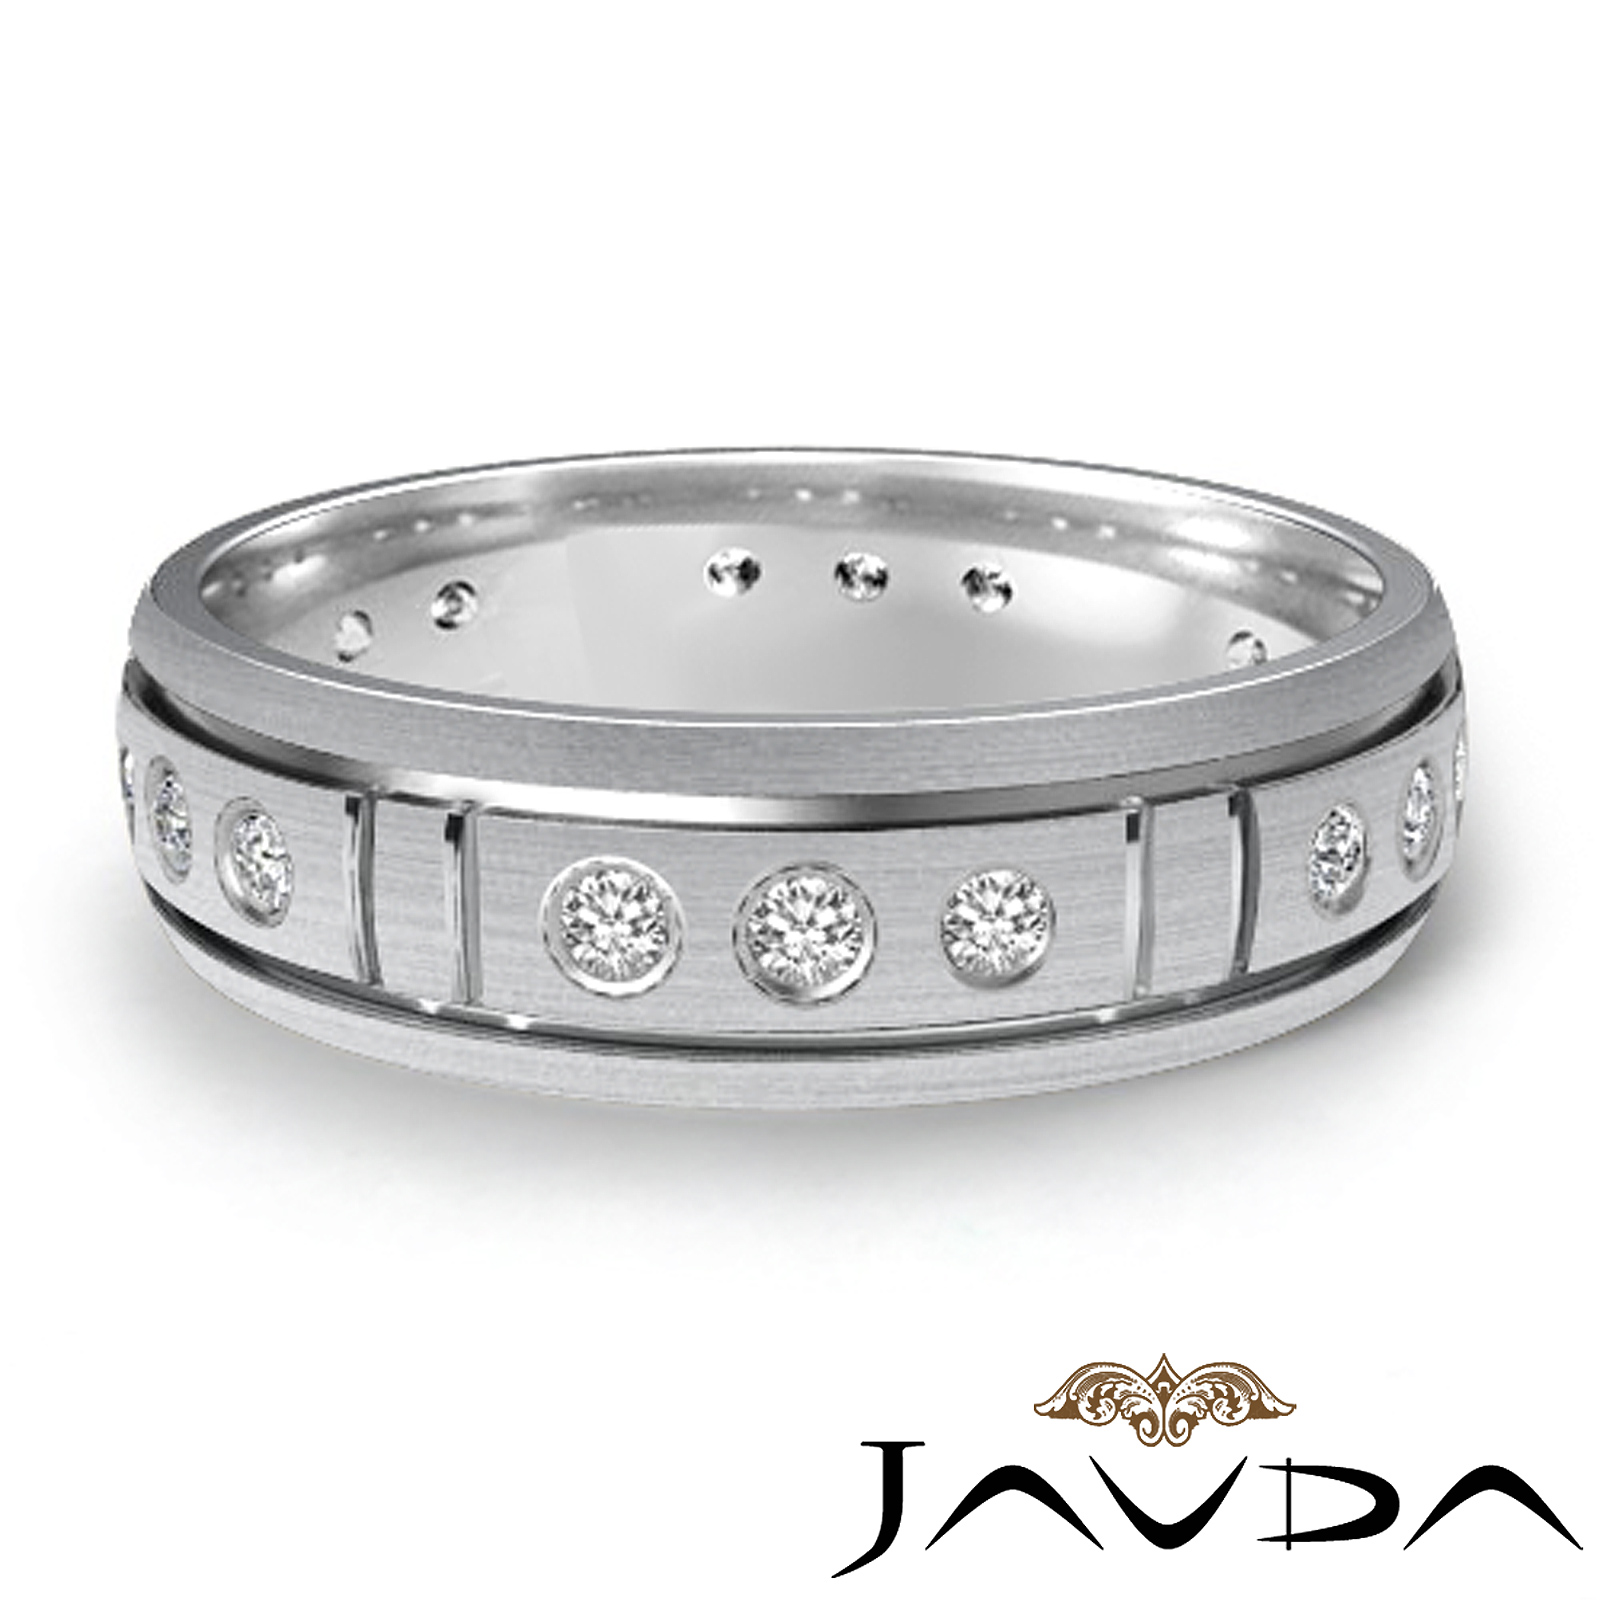 Round bezel diamond dome band mens eternity wedding ring for Mens eternity wedding band